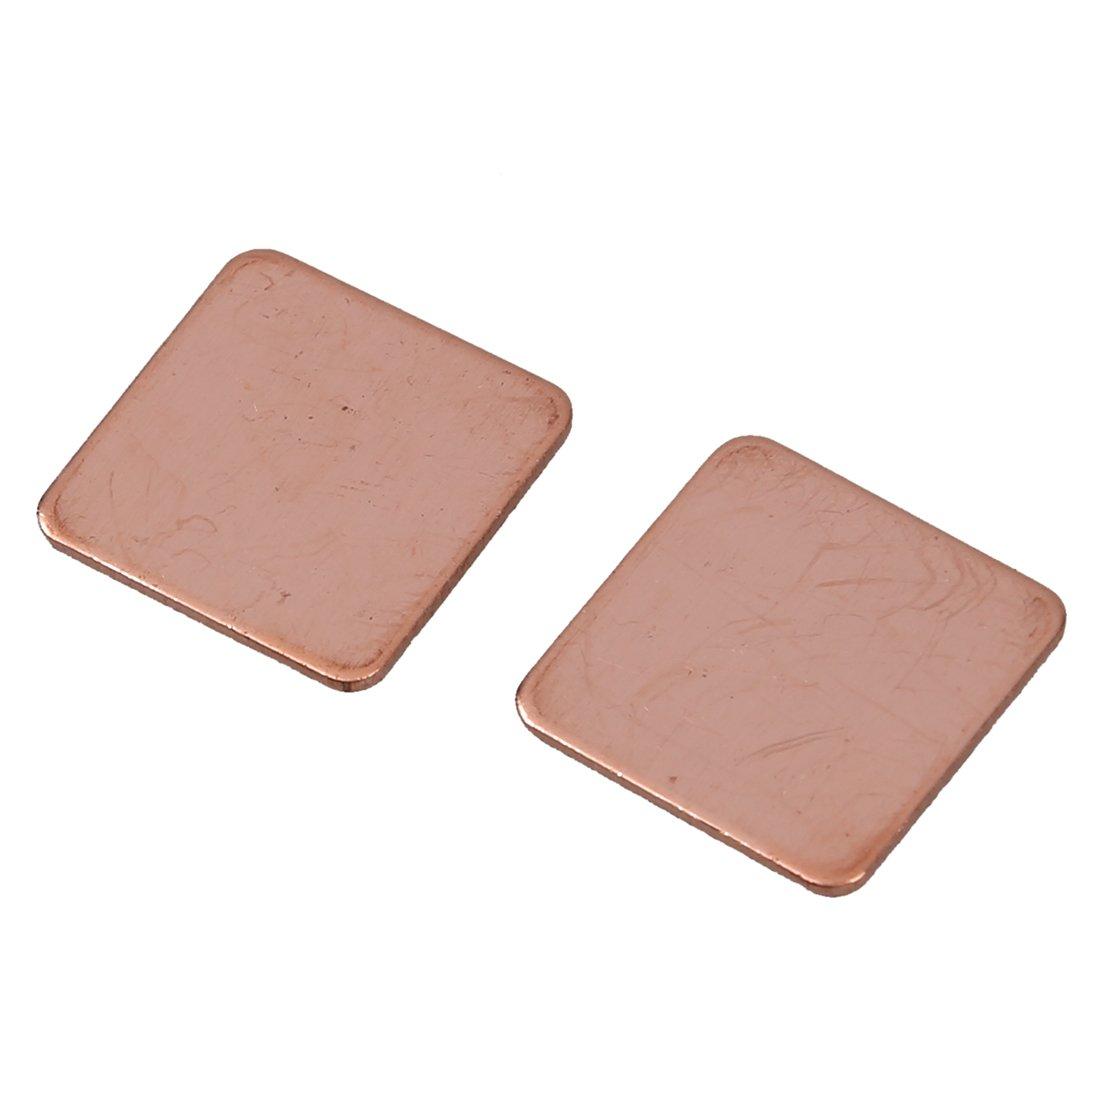 SODIAL(R) 2 x 0.8mm Thick Heatsink Thermal Pad Copper Shim for Laptop CPU GPU